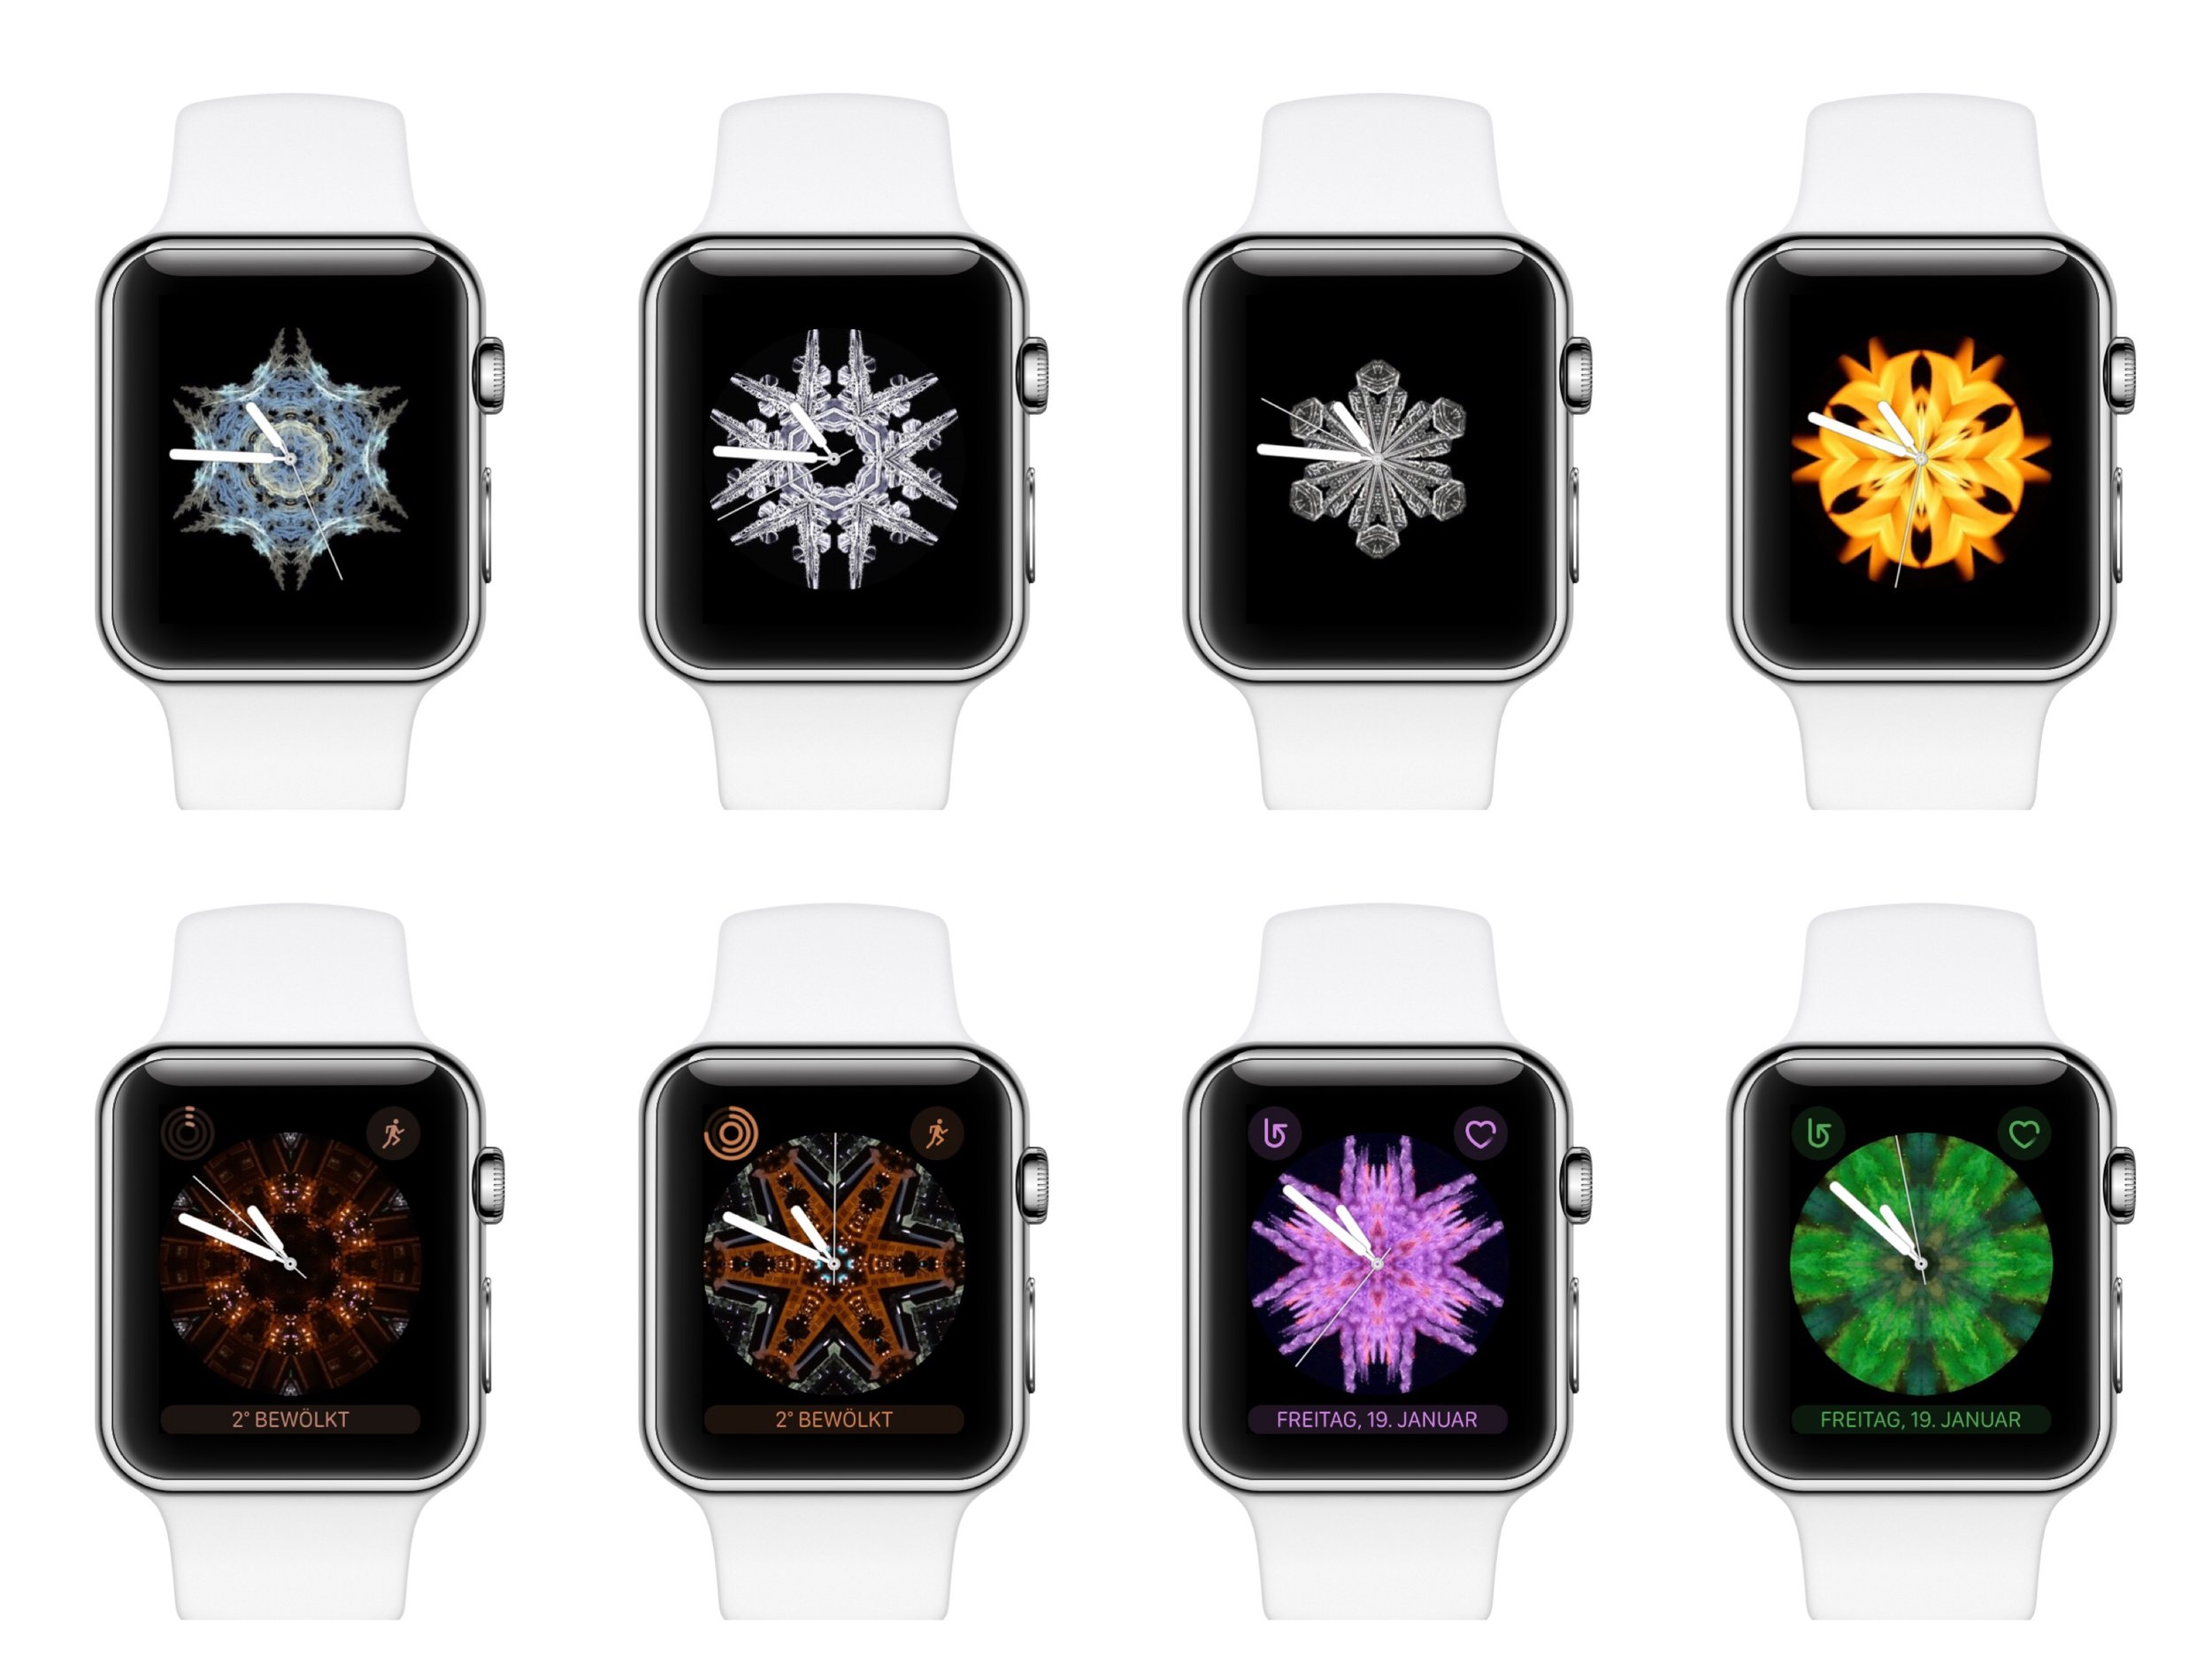 kaleidoscope watch faces for apple watch